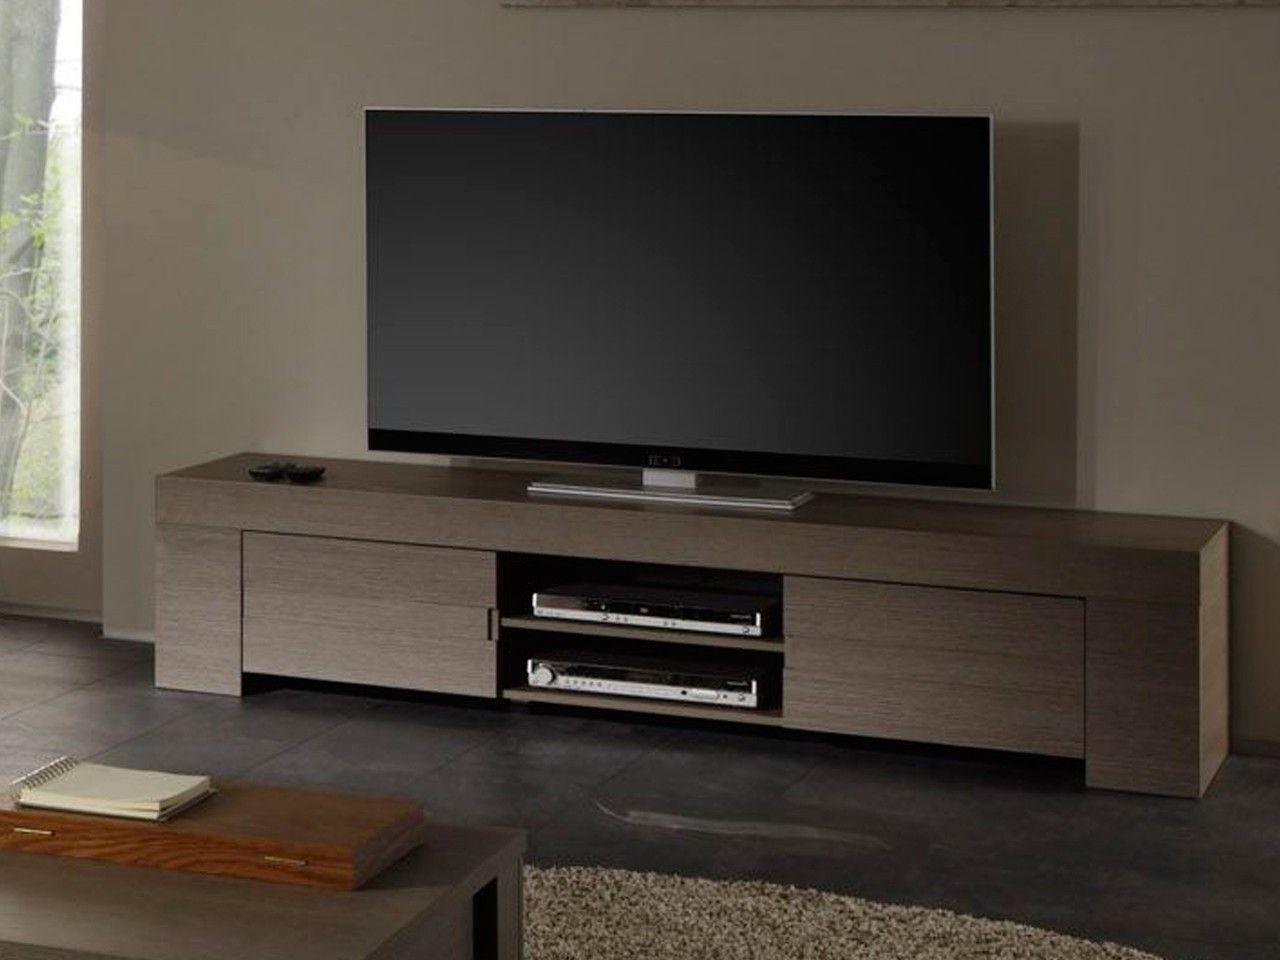 Pin De Ecthriz Toledo En Casa Pinterest Muebles Tv Modernos  # Muebles Sencillos Para Tv